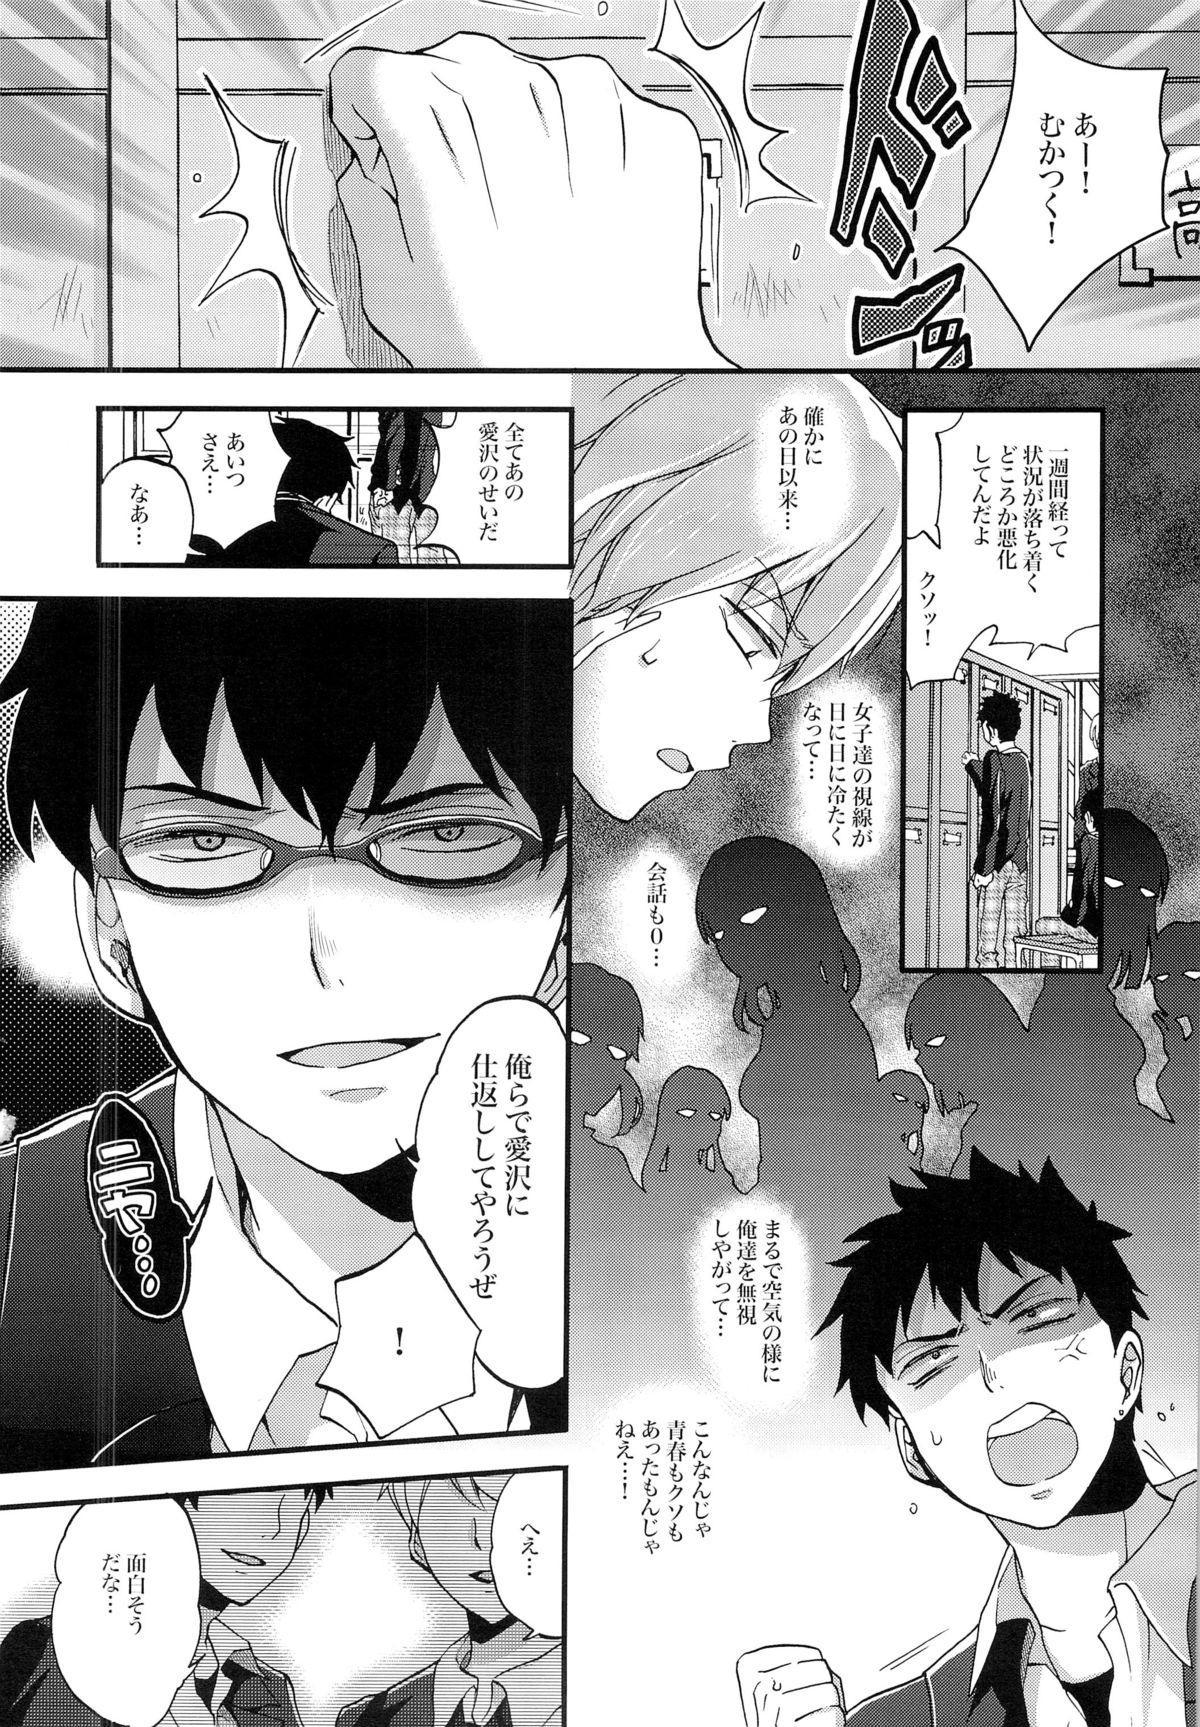 Namaiki na Classmate ni Kyousei Kyouiku 4